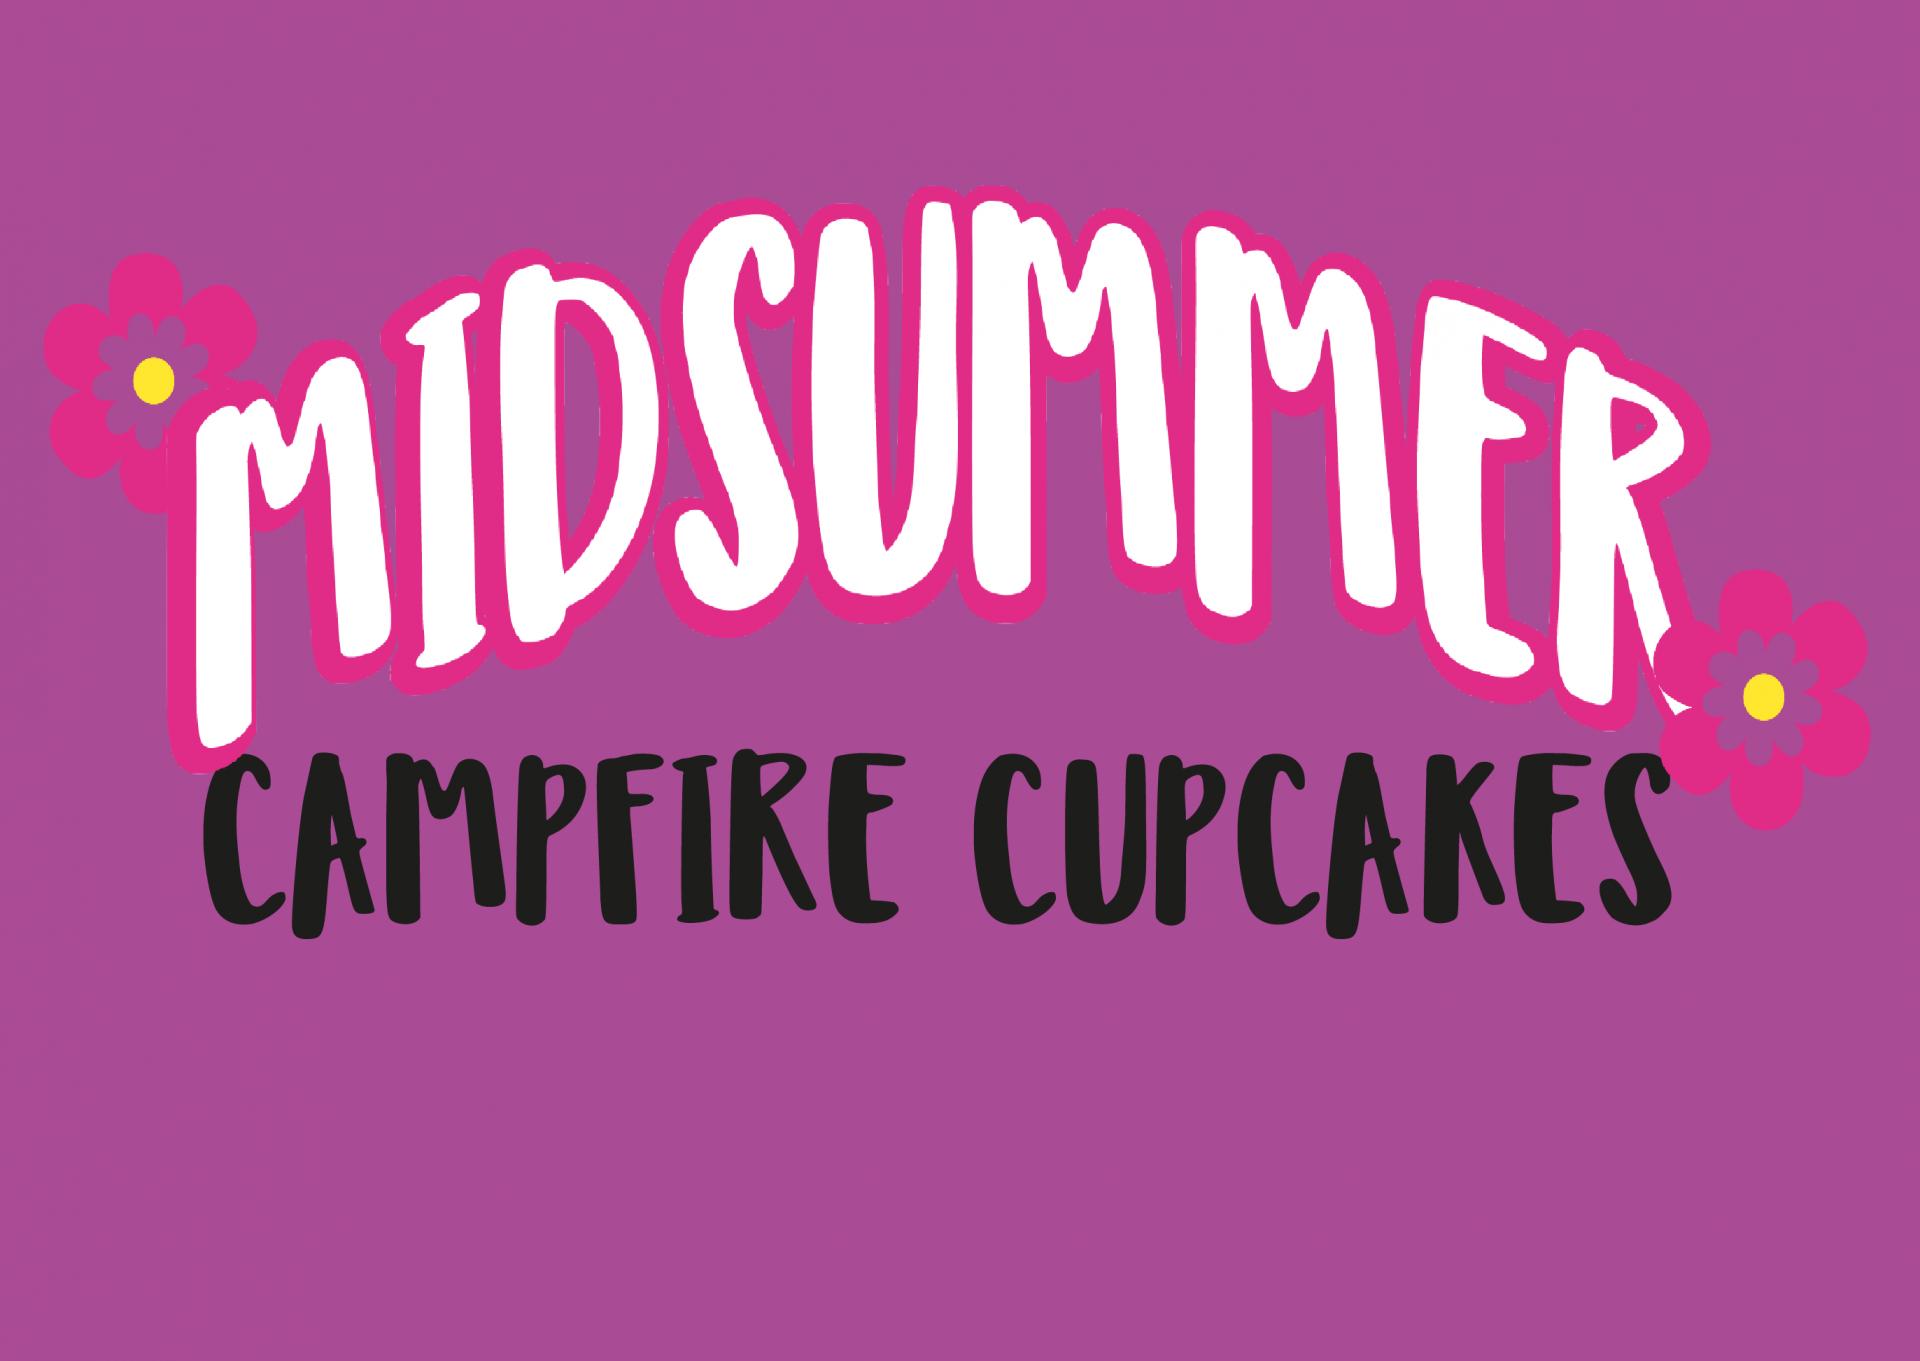 image relating to Campfire Cupcake